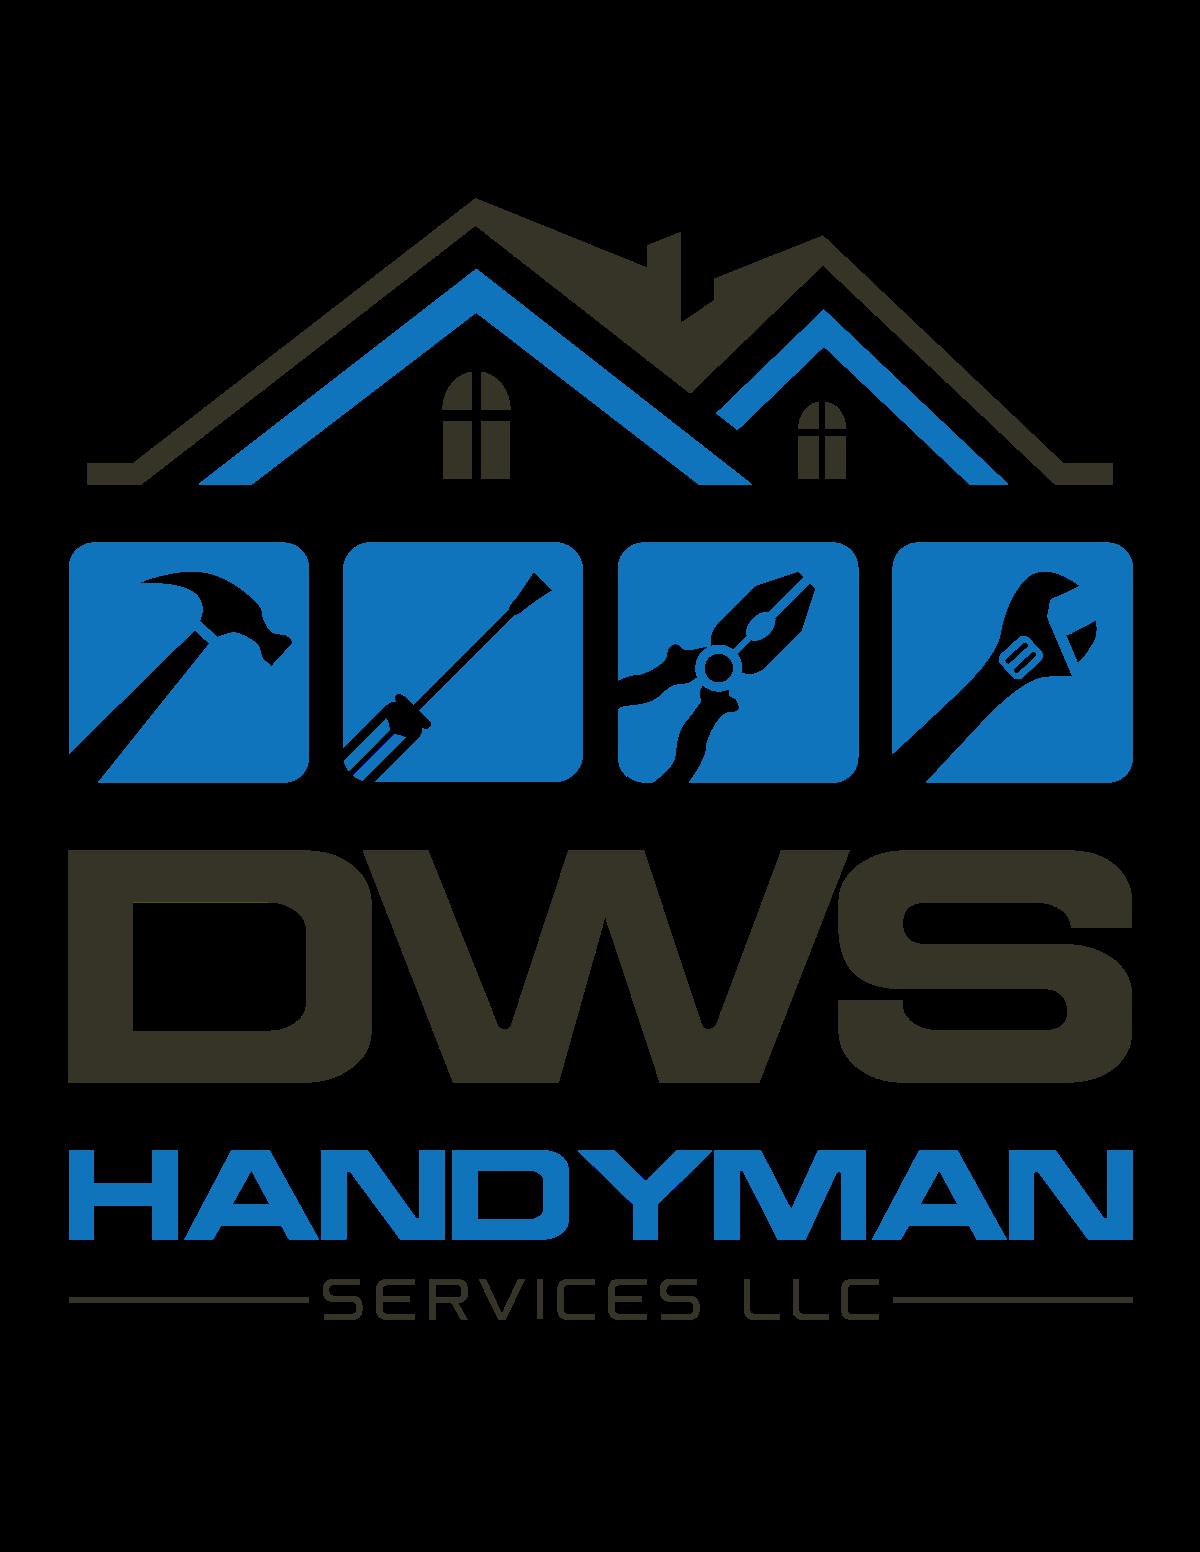 DWS Handyman Services, LLC Logo